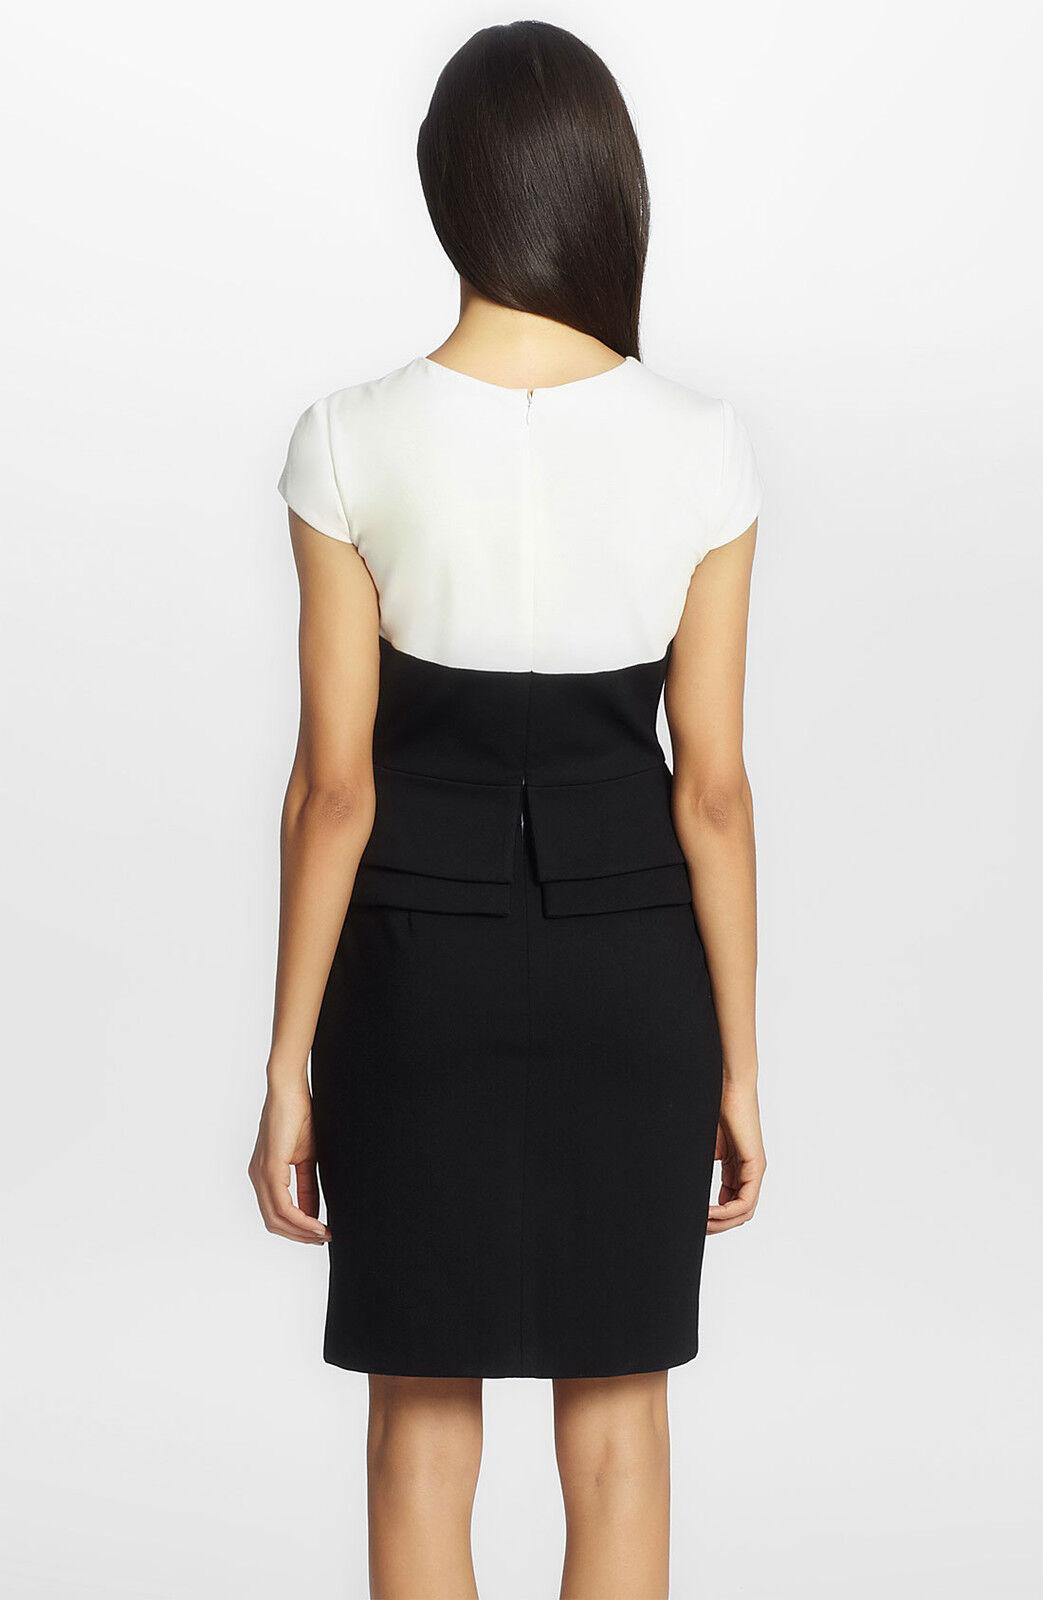 Cynthia Steffe Emily Ponte Peplum Peplum Peplum Dress (Size 6) e4e257